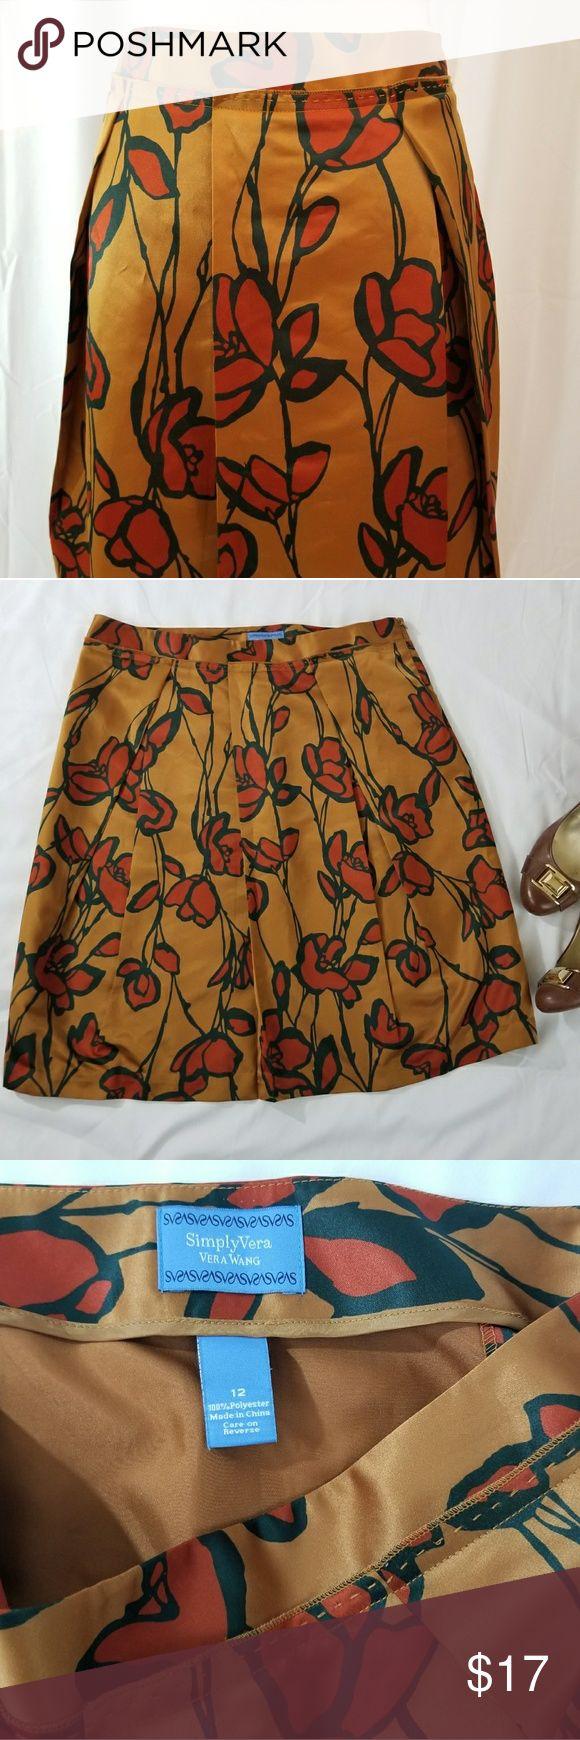 Simply Vera Wang Skirt size 12 Simply Vera Wang Skirt size 12 Beautiful Longer Aline skirt perfect for work to evening  A-26 Simply Vera Vera Wang Skirts A-Line or Full